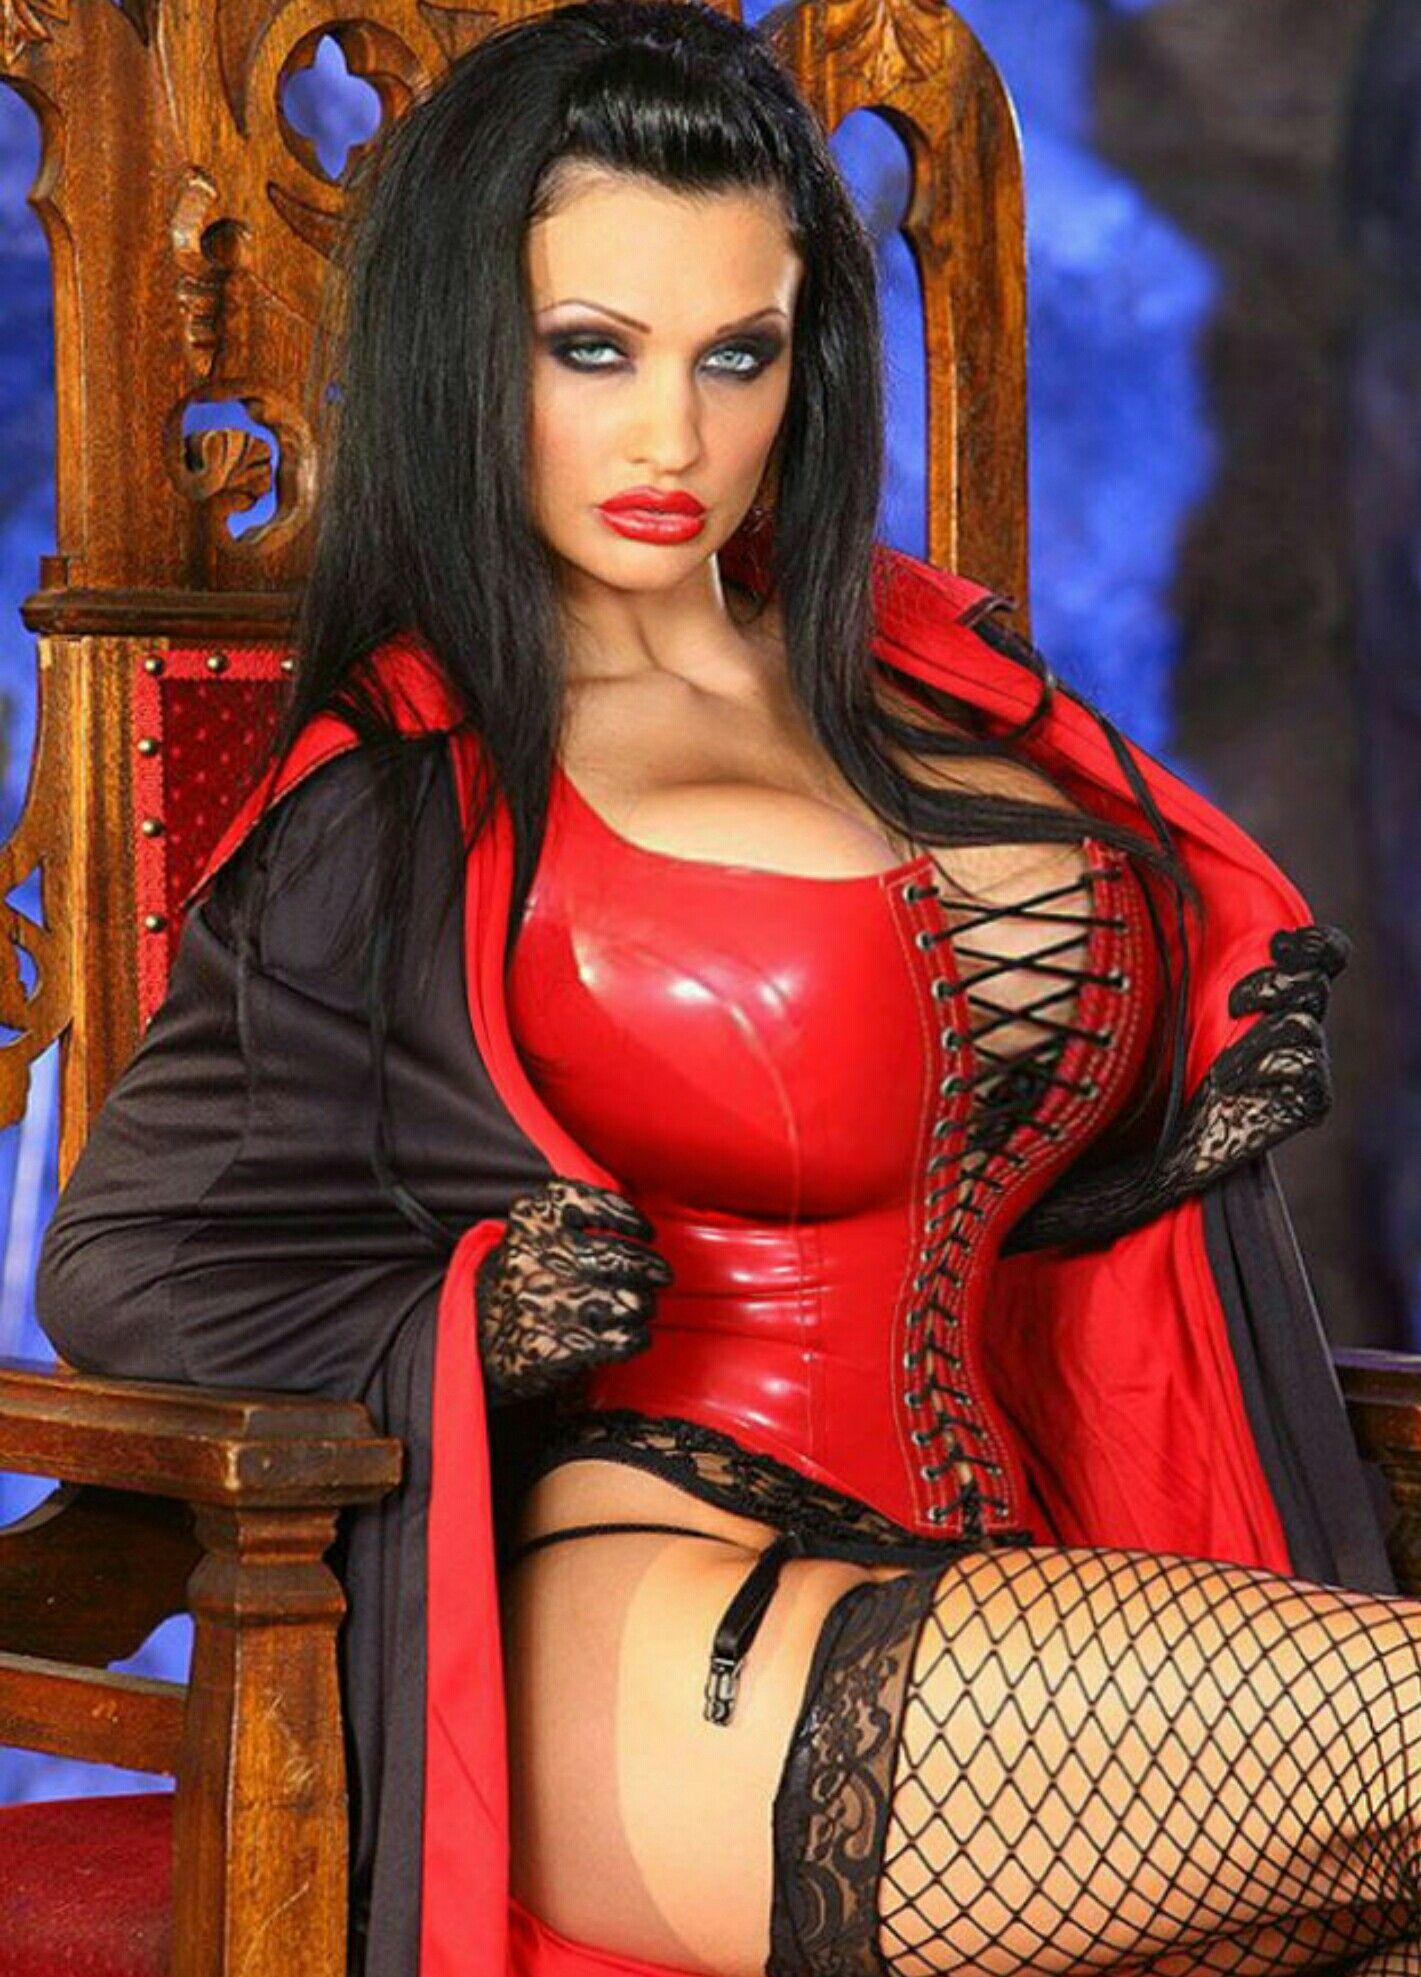 Very kind and Hardcore asiatische BDSM ebony petite woman